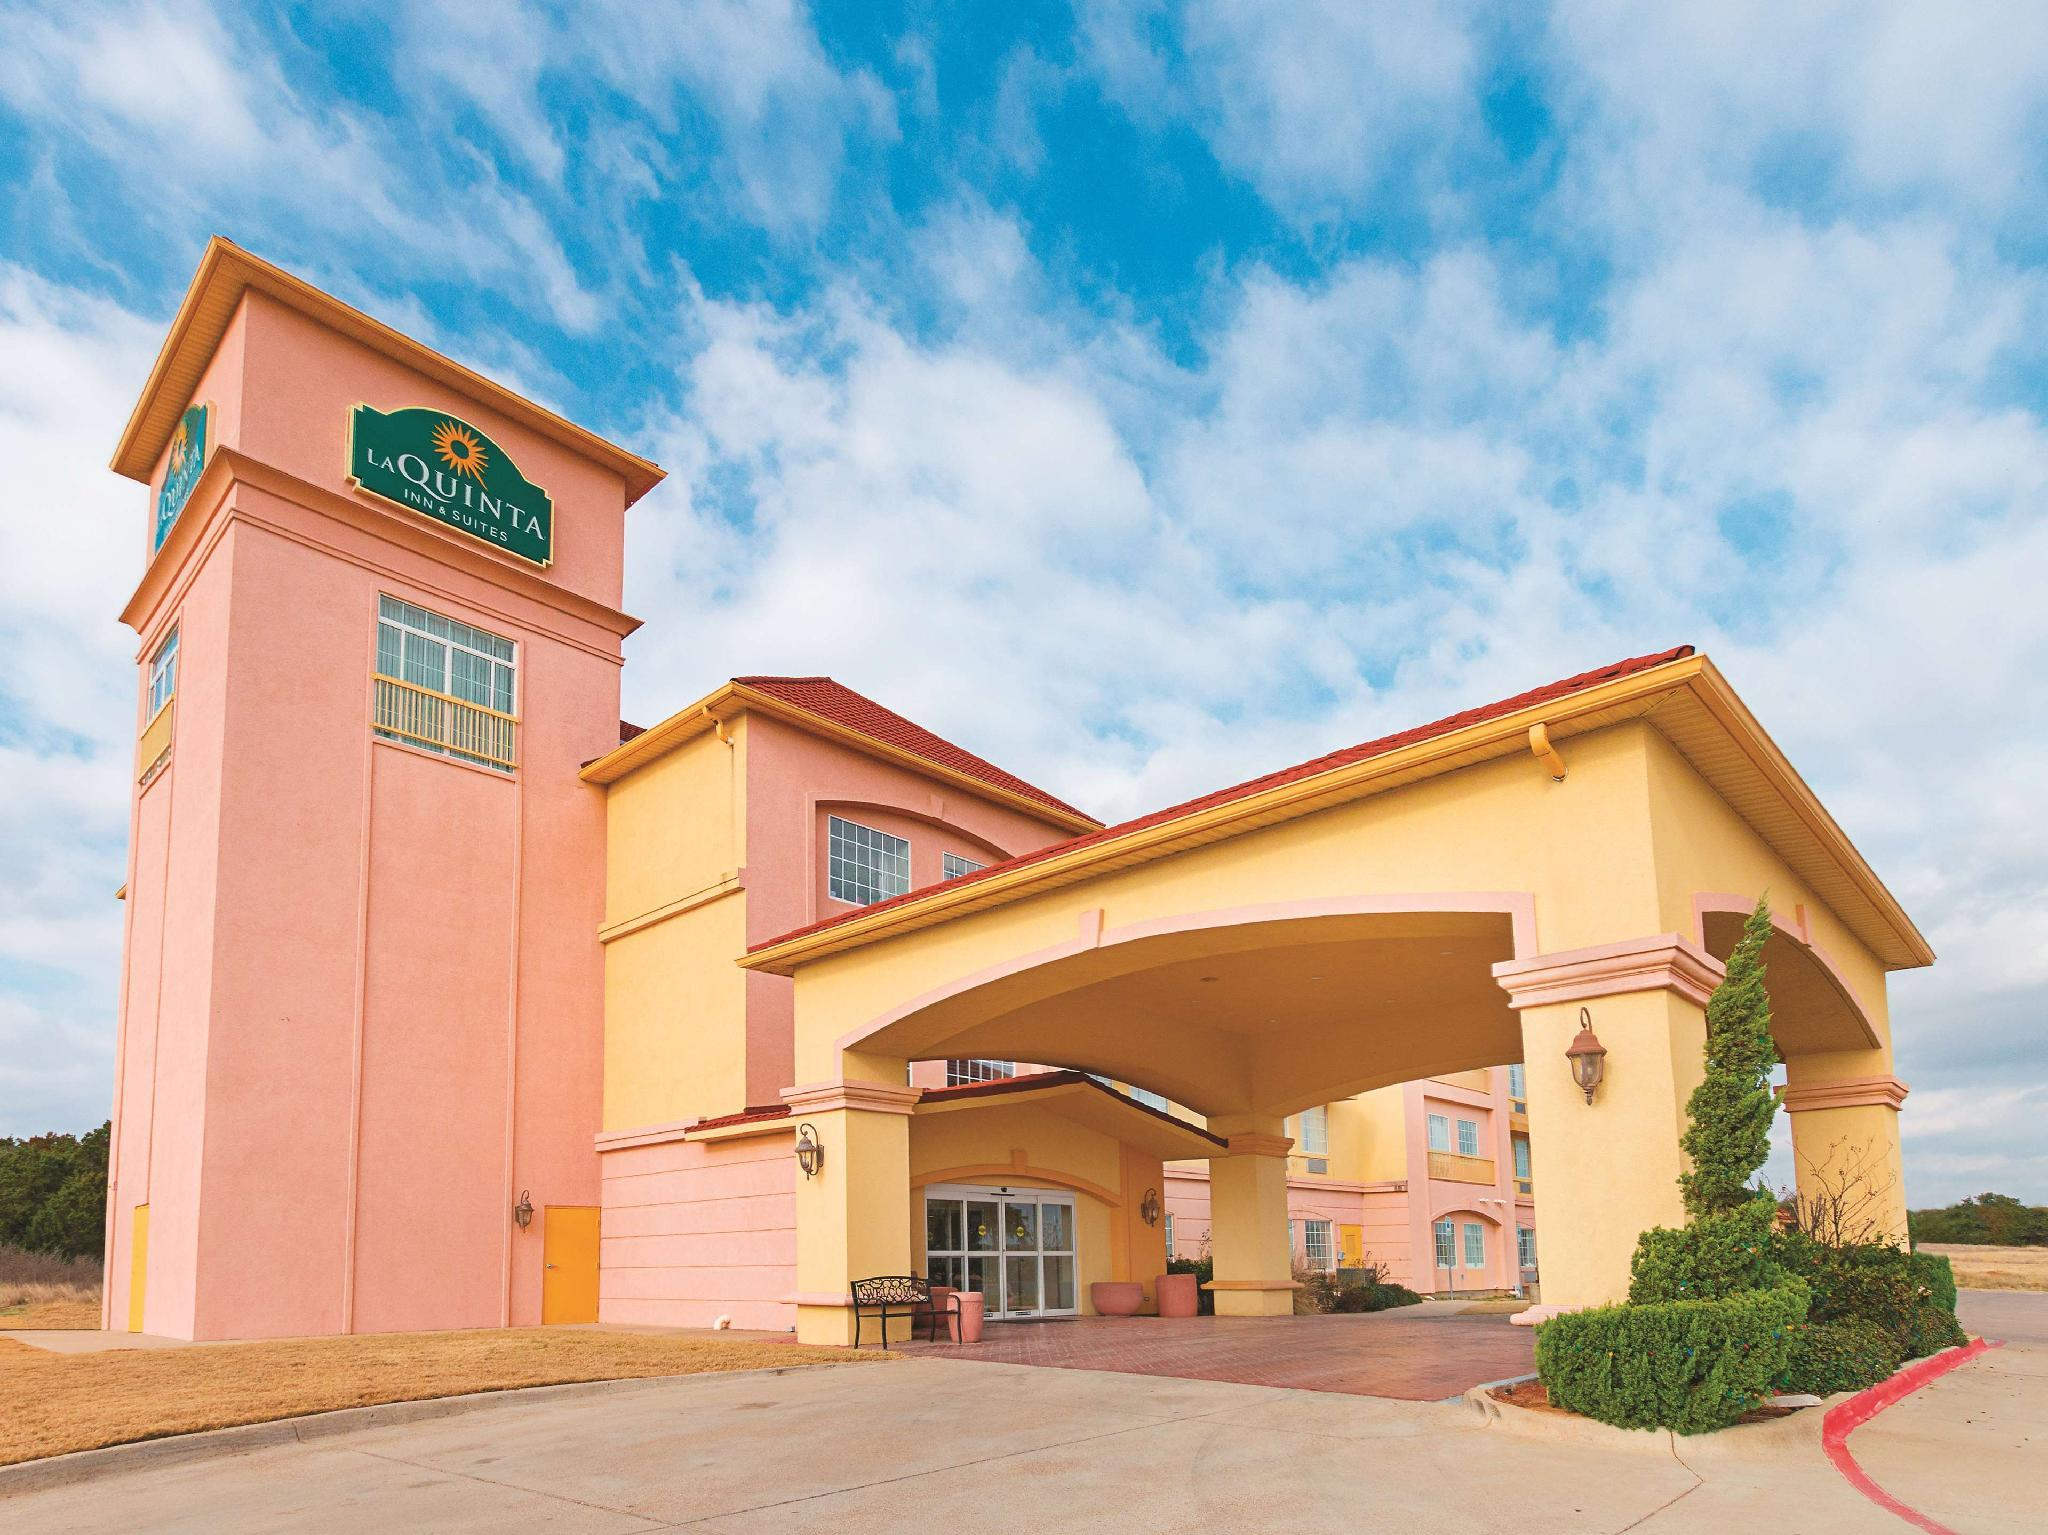 La Quinta Inn And Suites By Wyndham Glen Rose